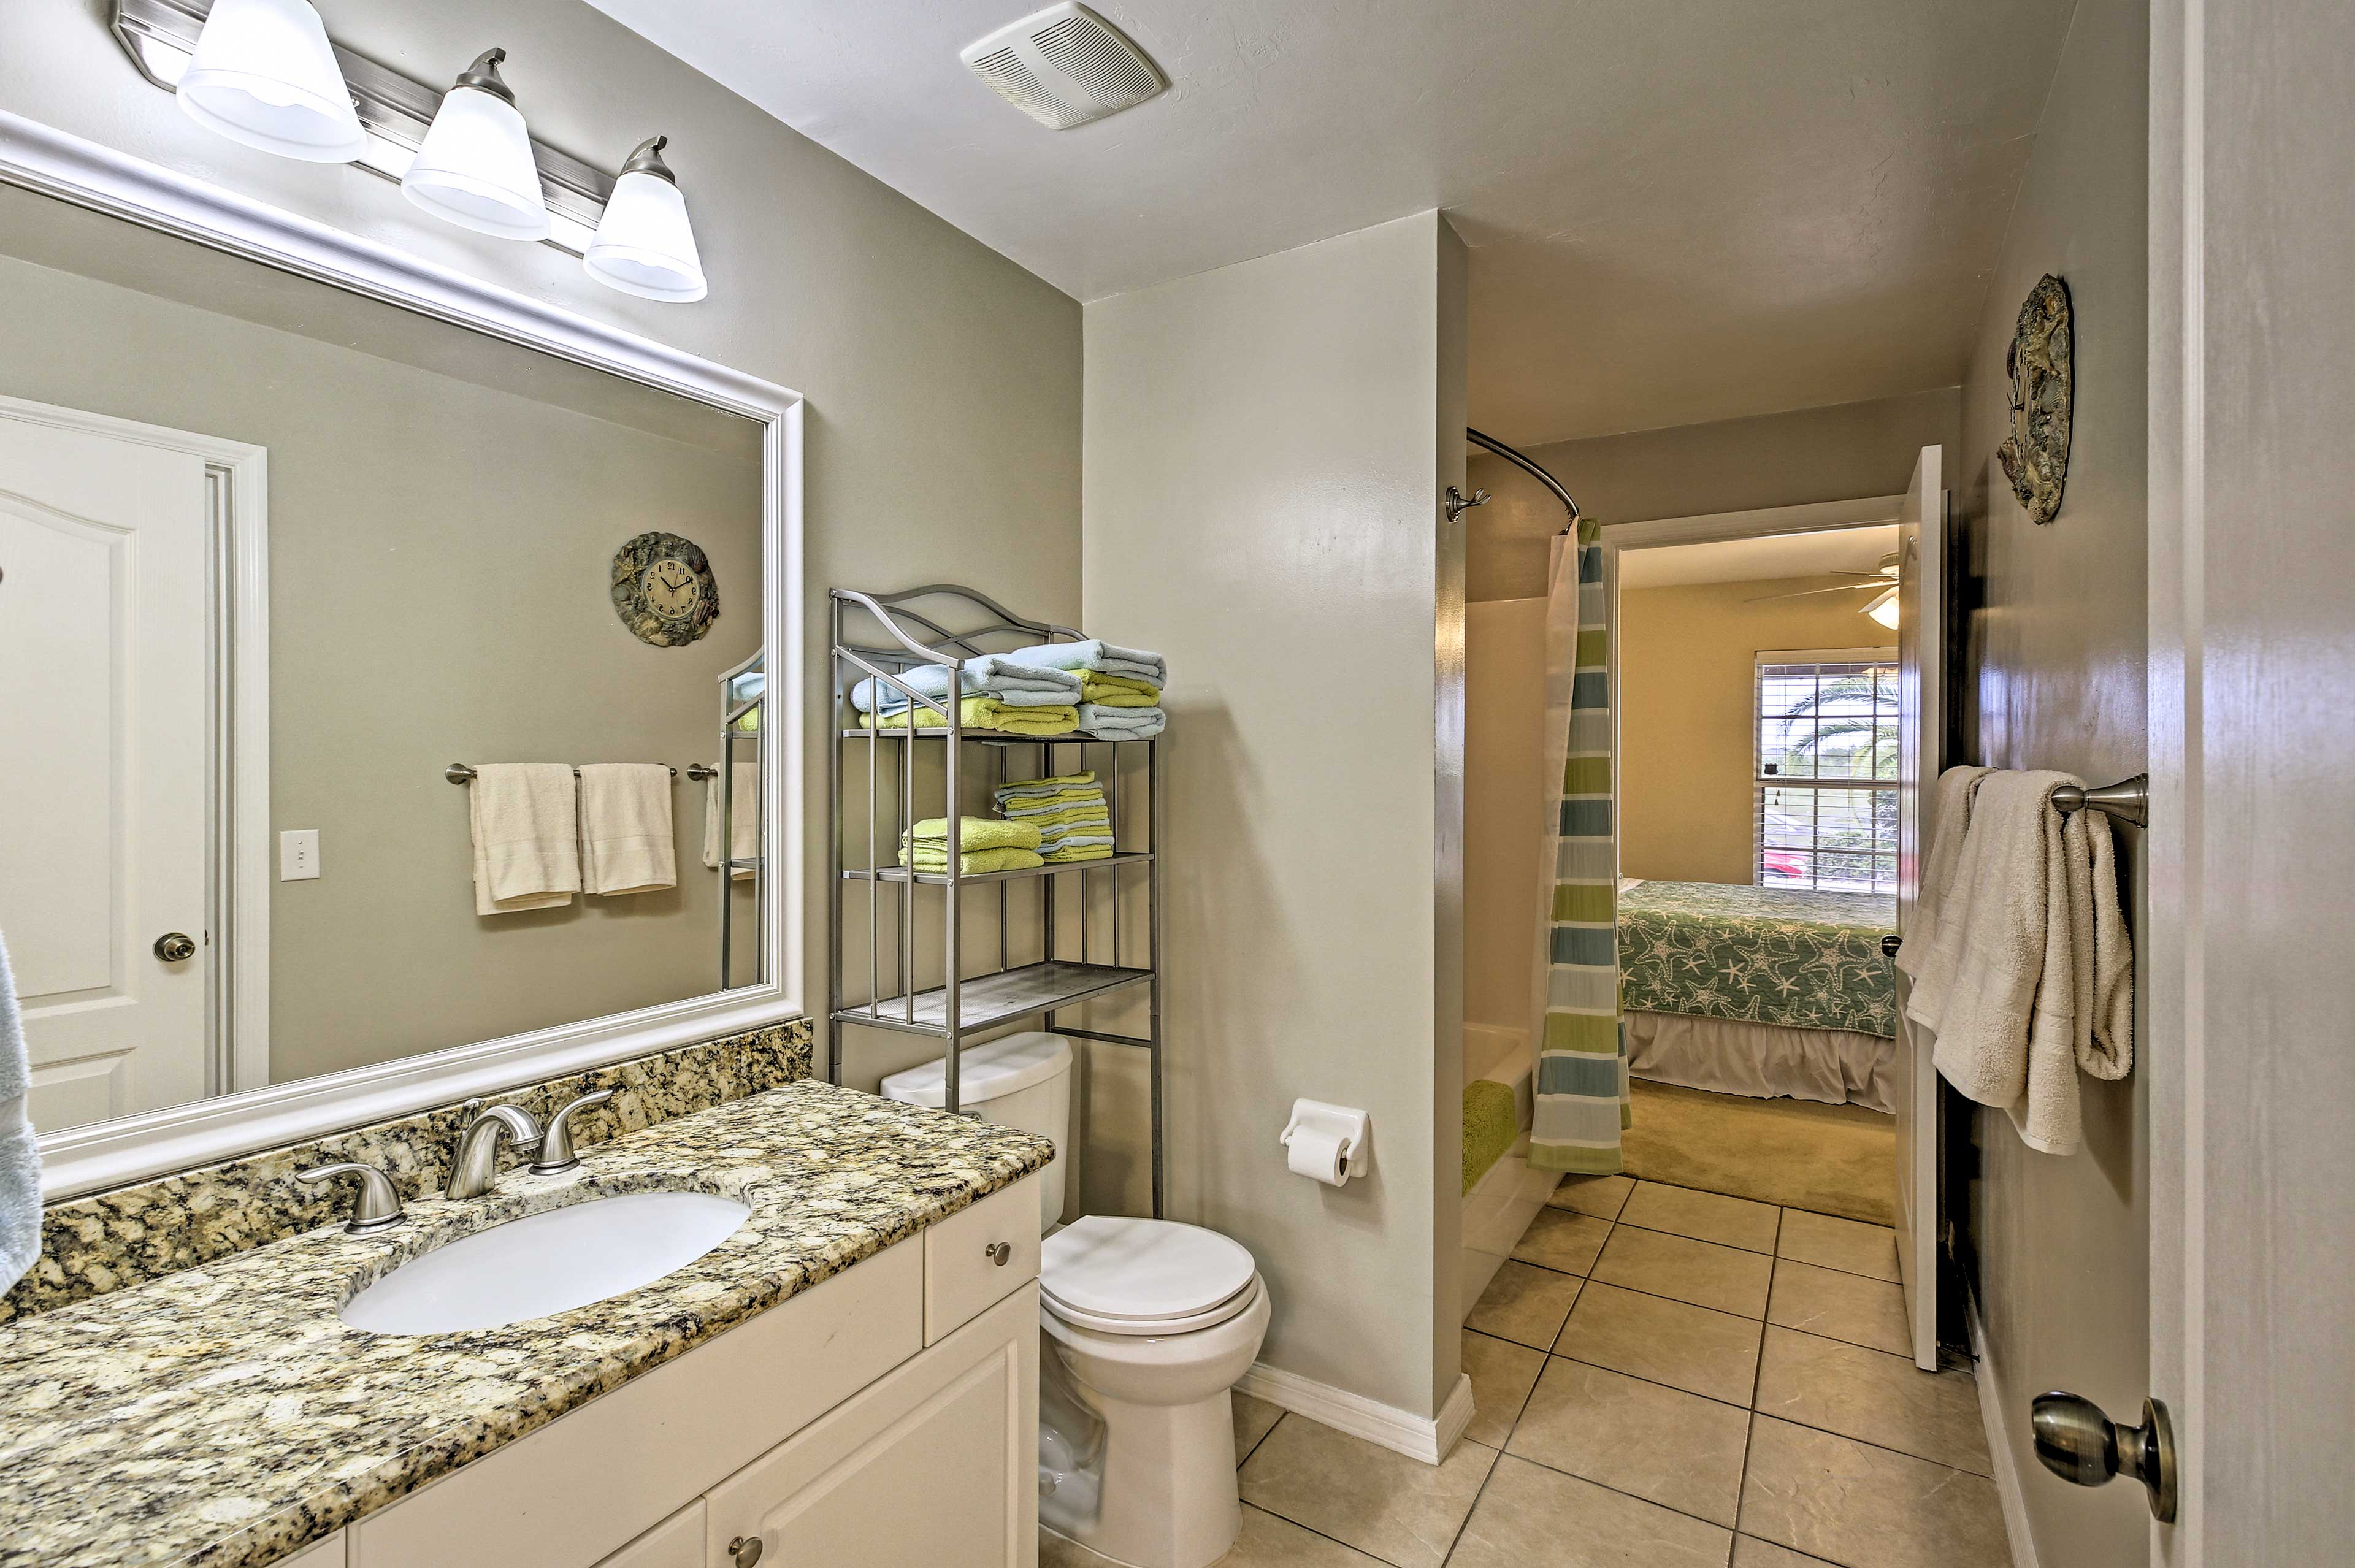 The room has a Jack-and-Jill bathroom.